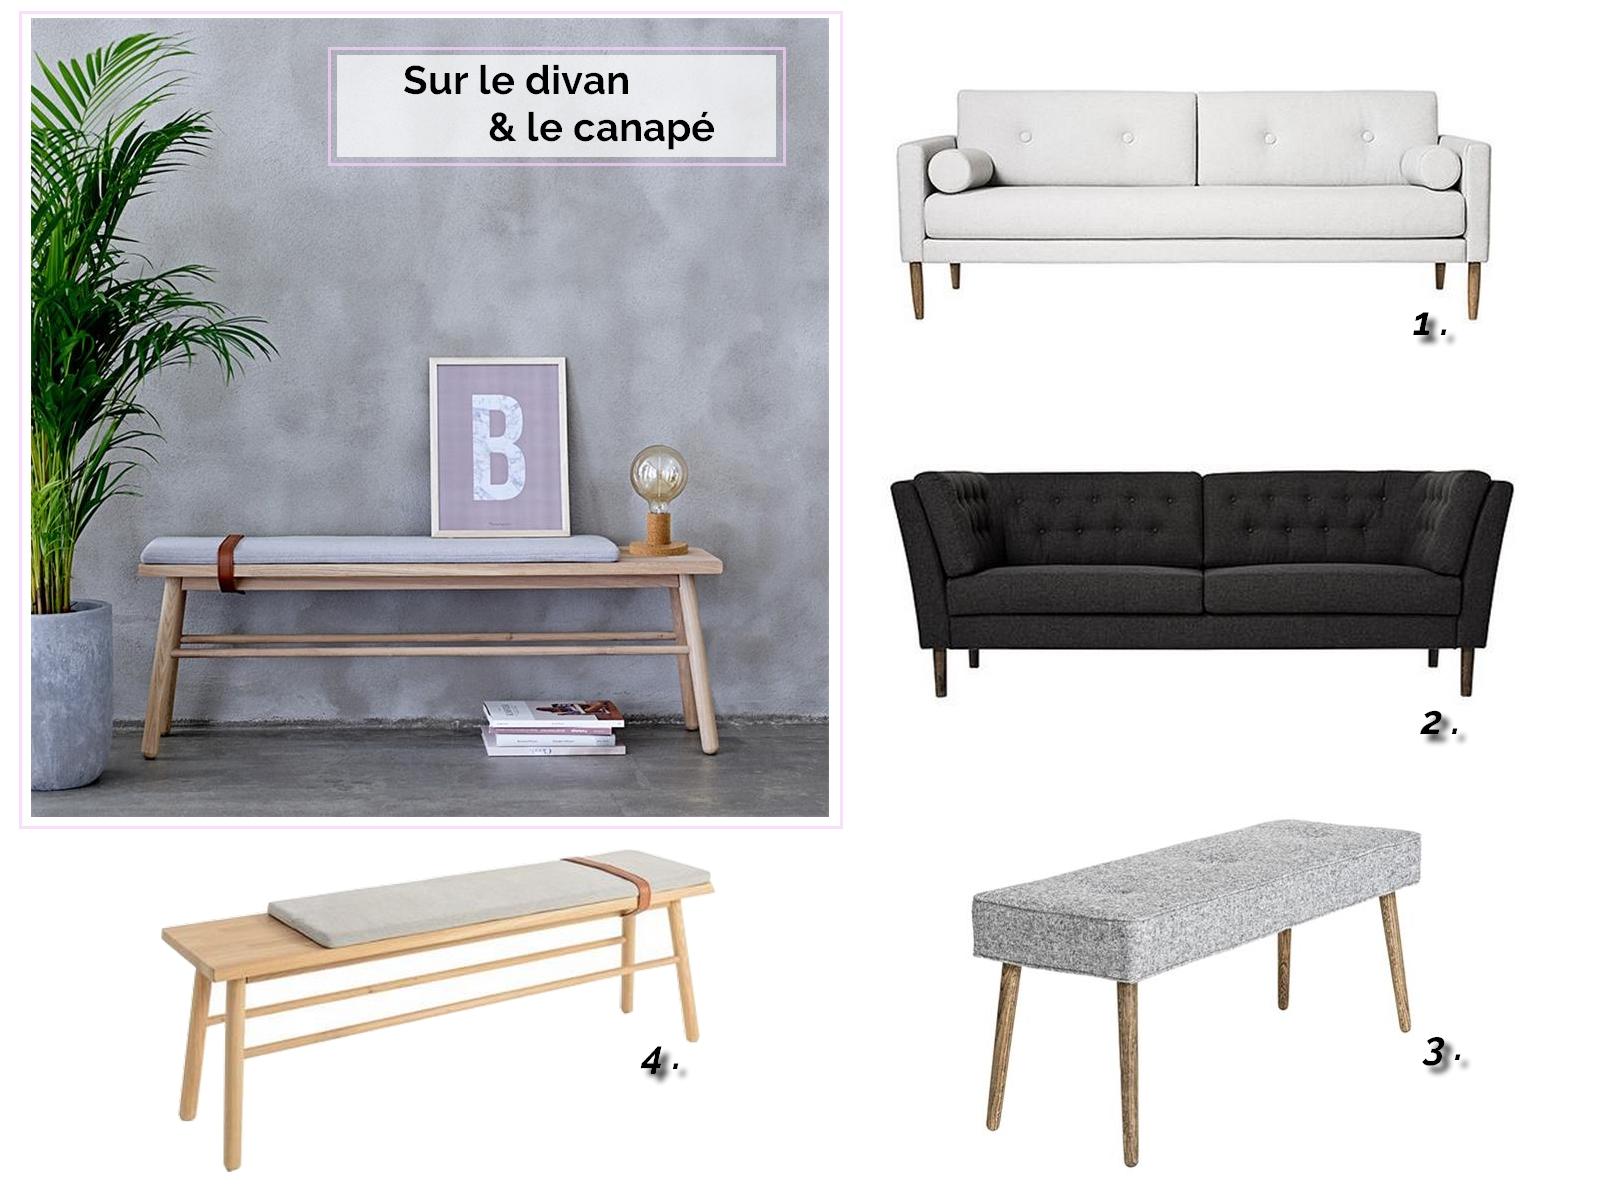 canapé design, canapé tissu, canapé gris, banc en bois, banc design, banc scandinave, canapé design